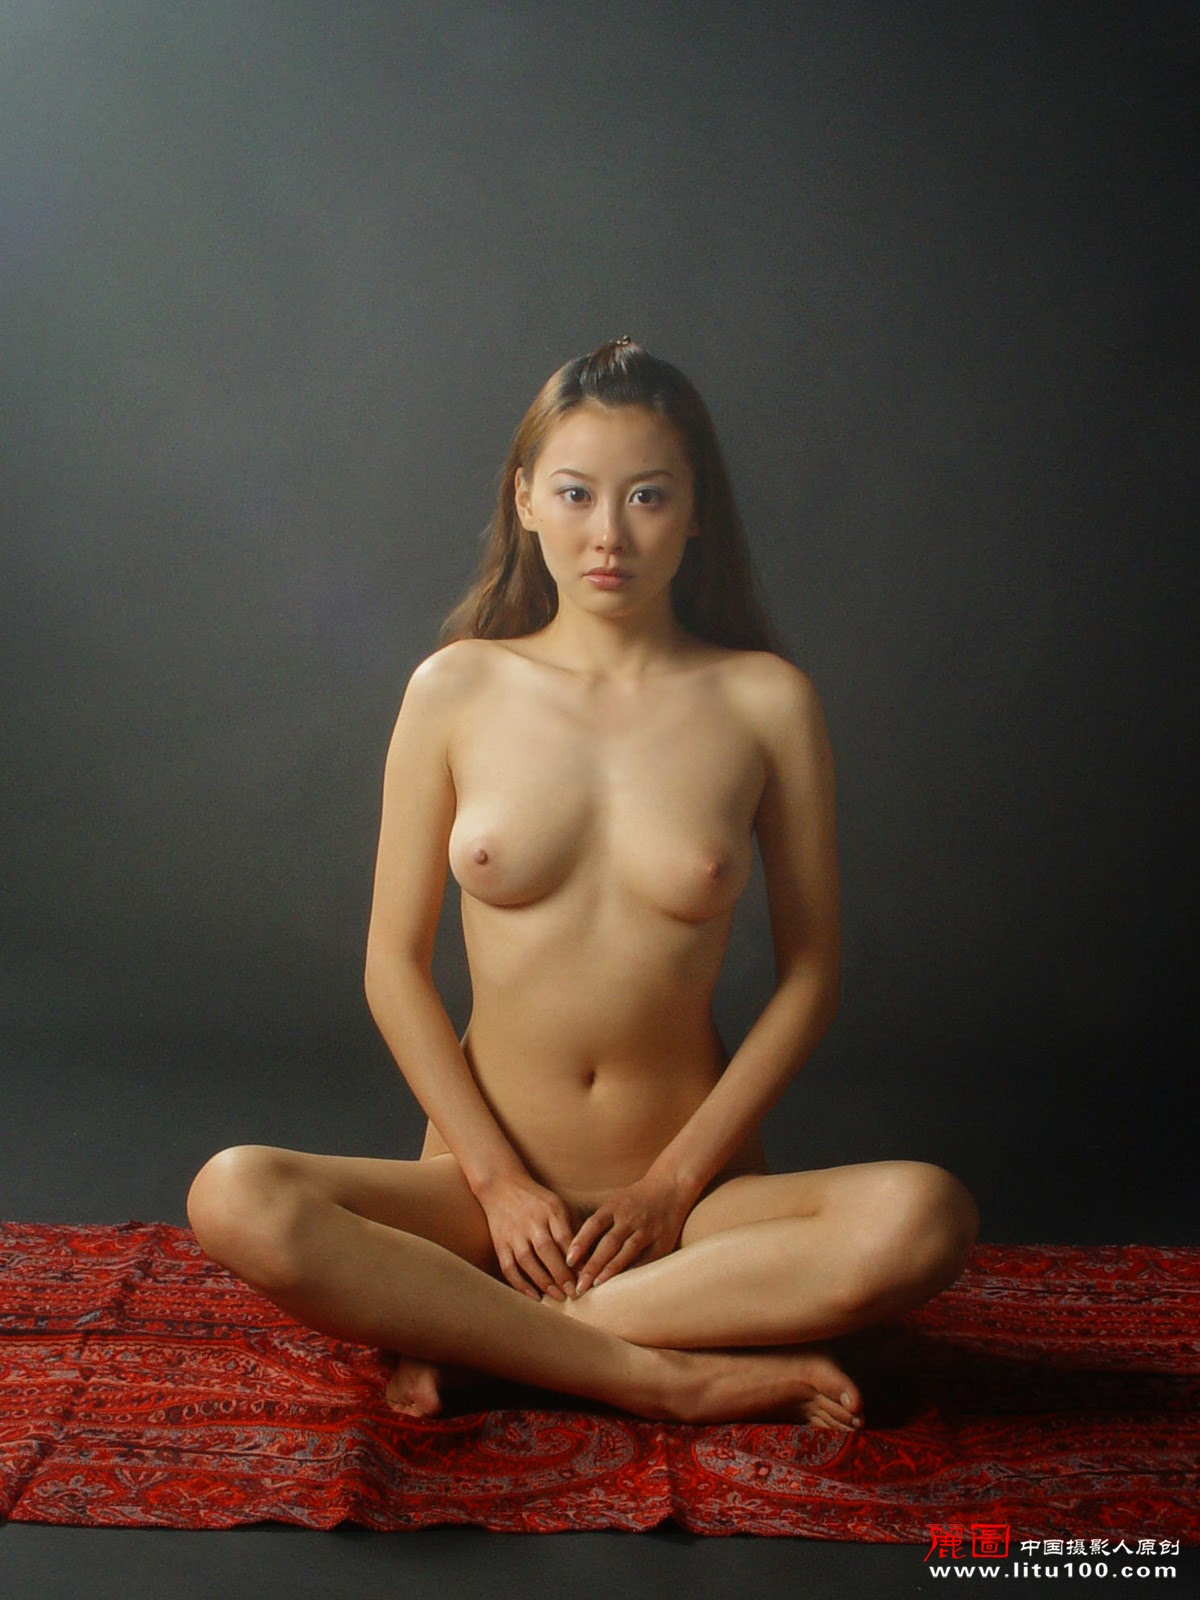 Wang  nackt Jessica Jessica Wang